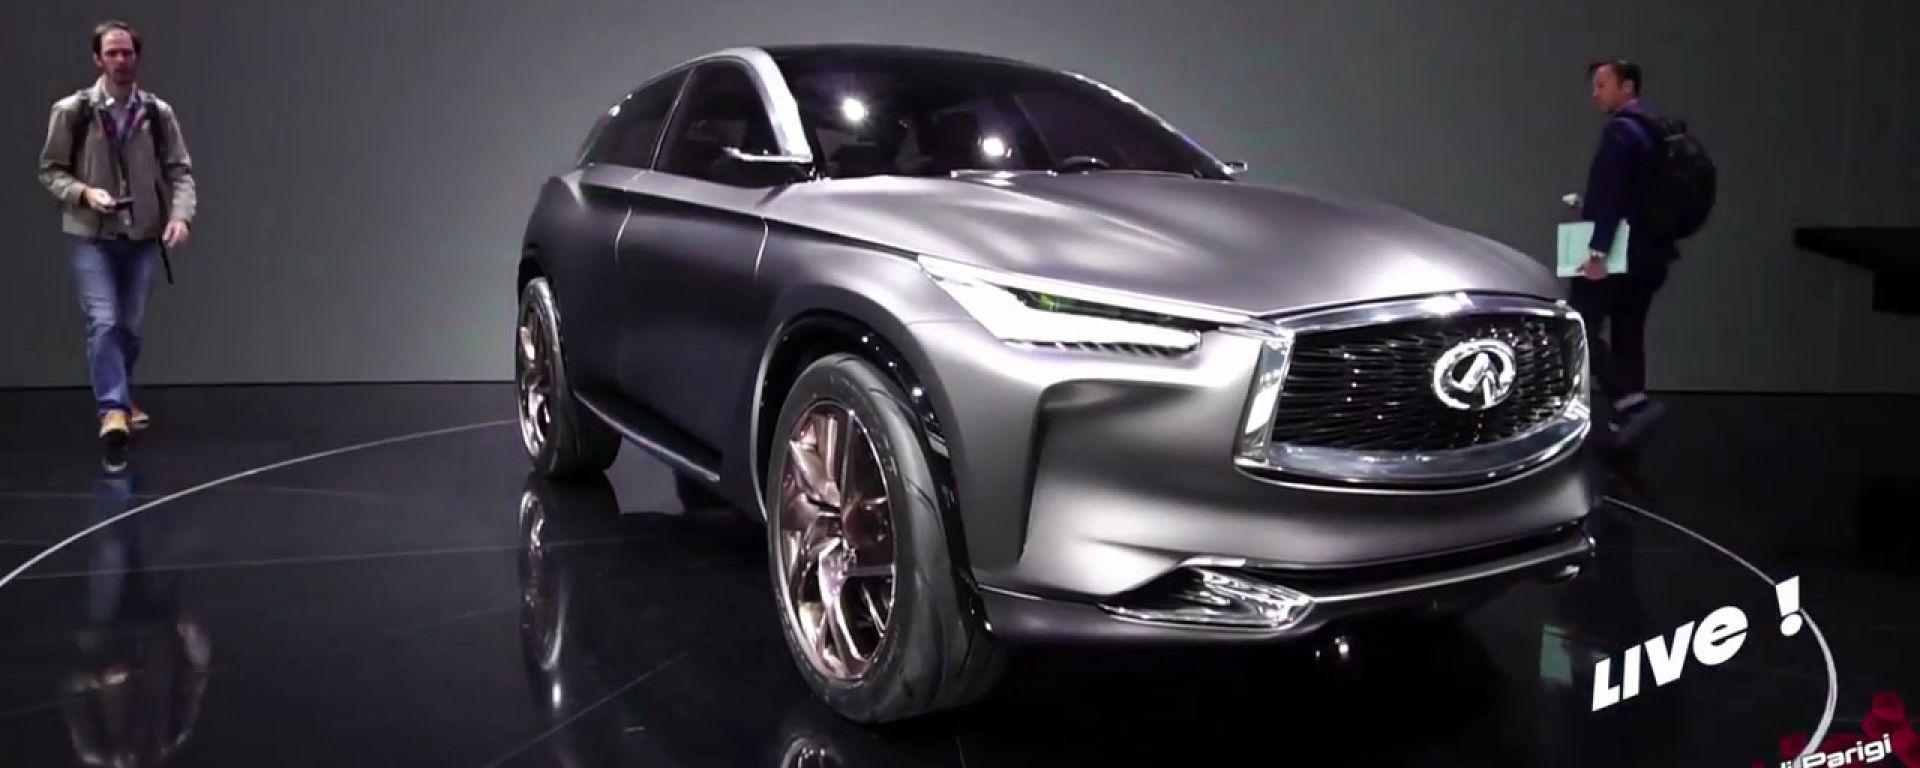 Live Parigi 2016: Infiniti QX Inspiration Concept e motore VC-T in video